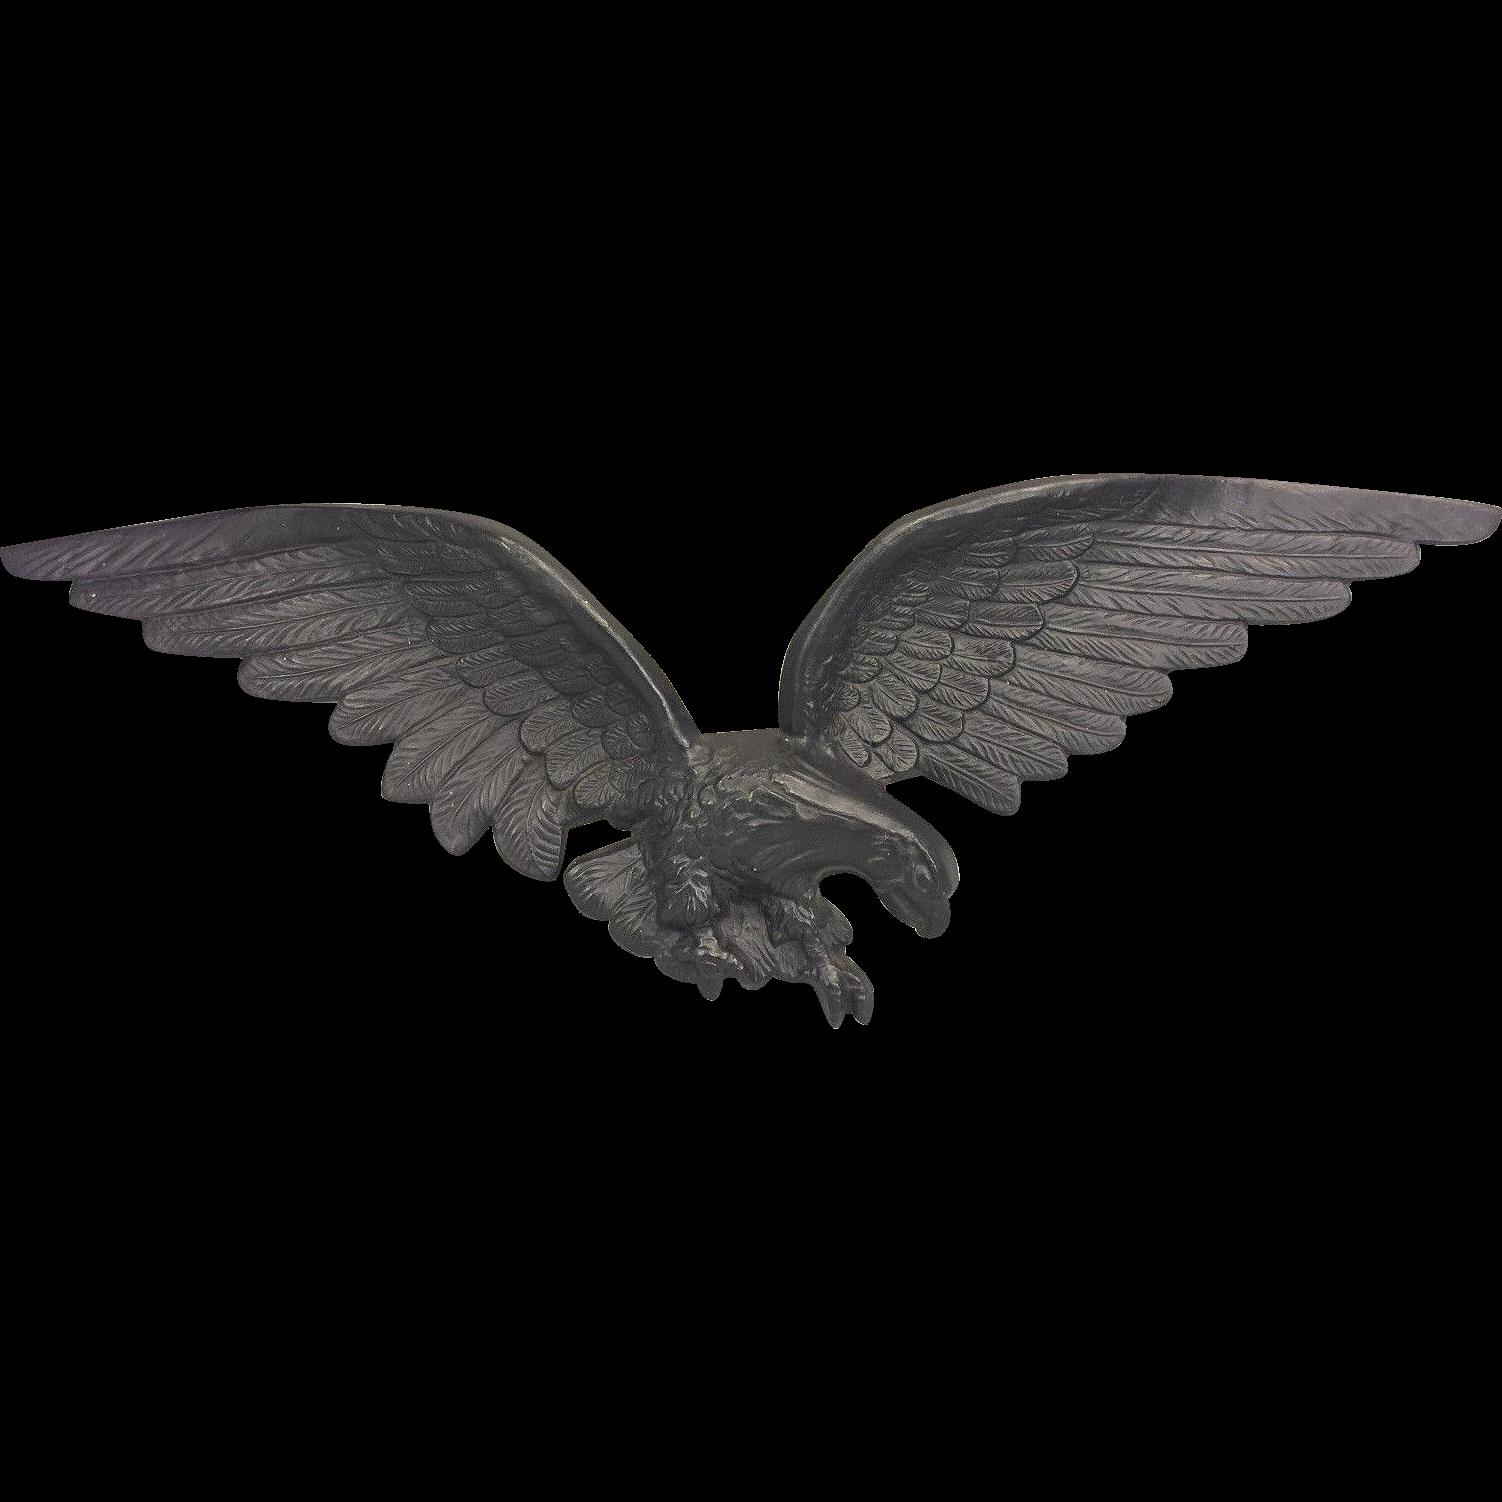 pin 1440x900 american eagle - photo #33